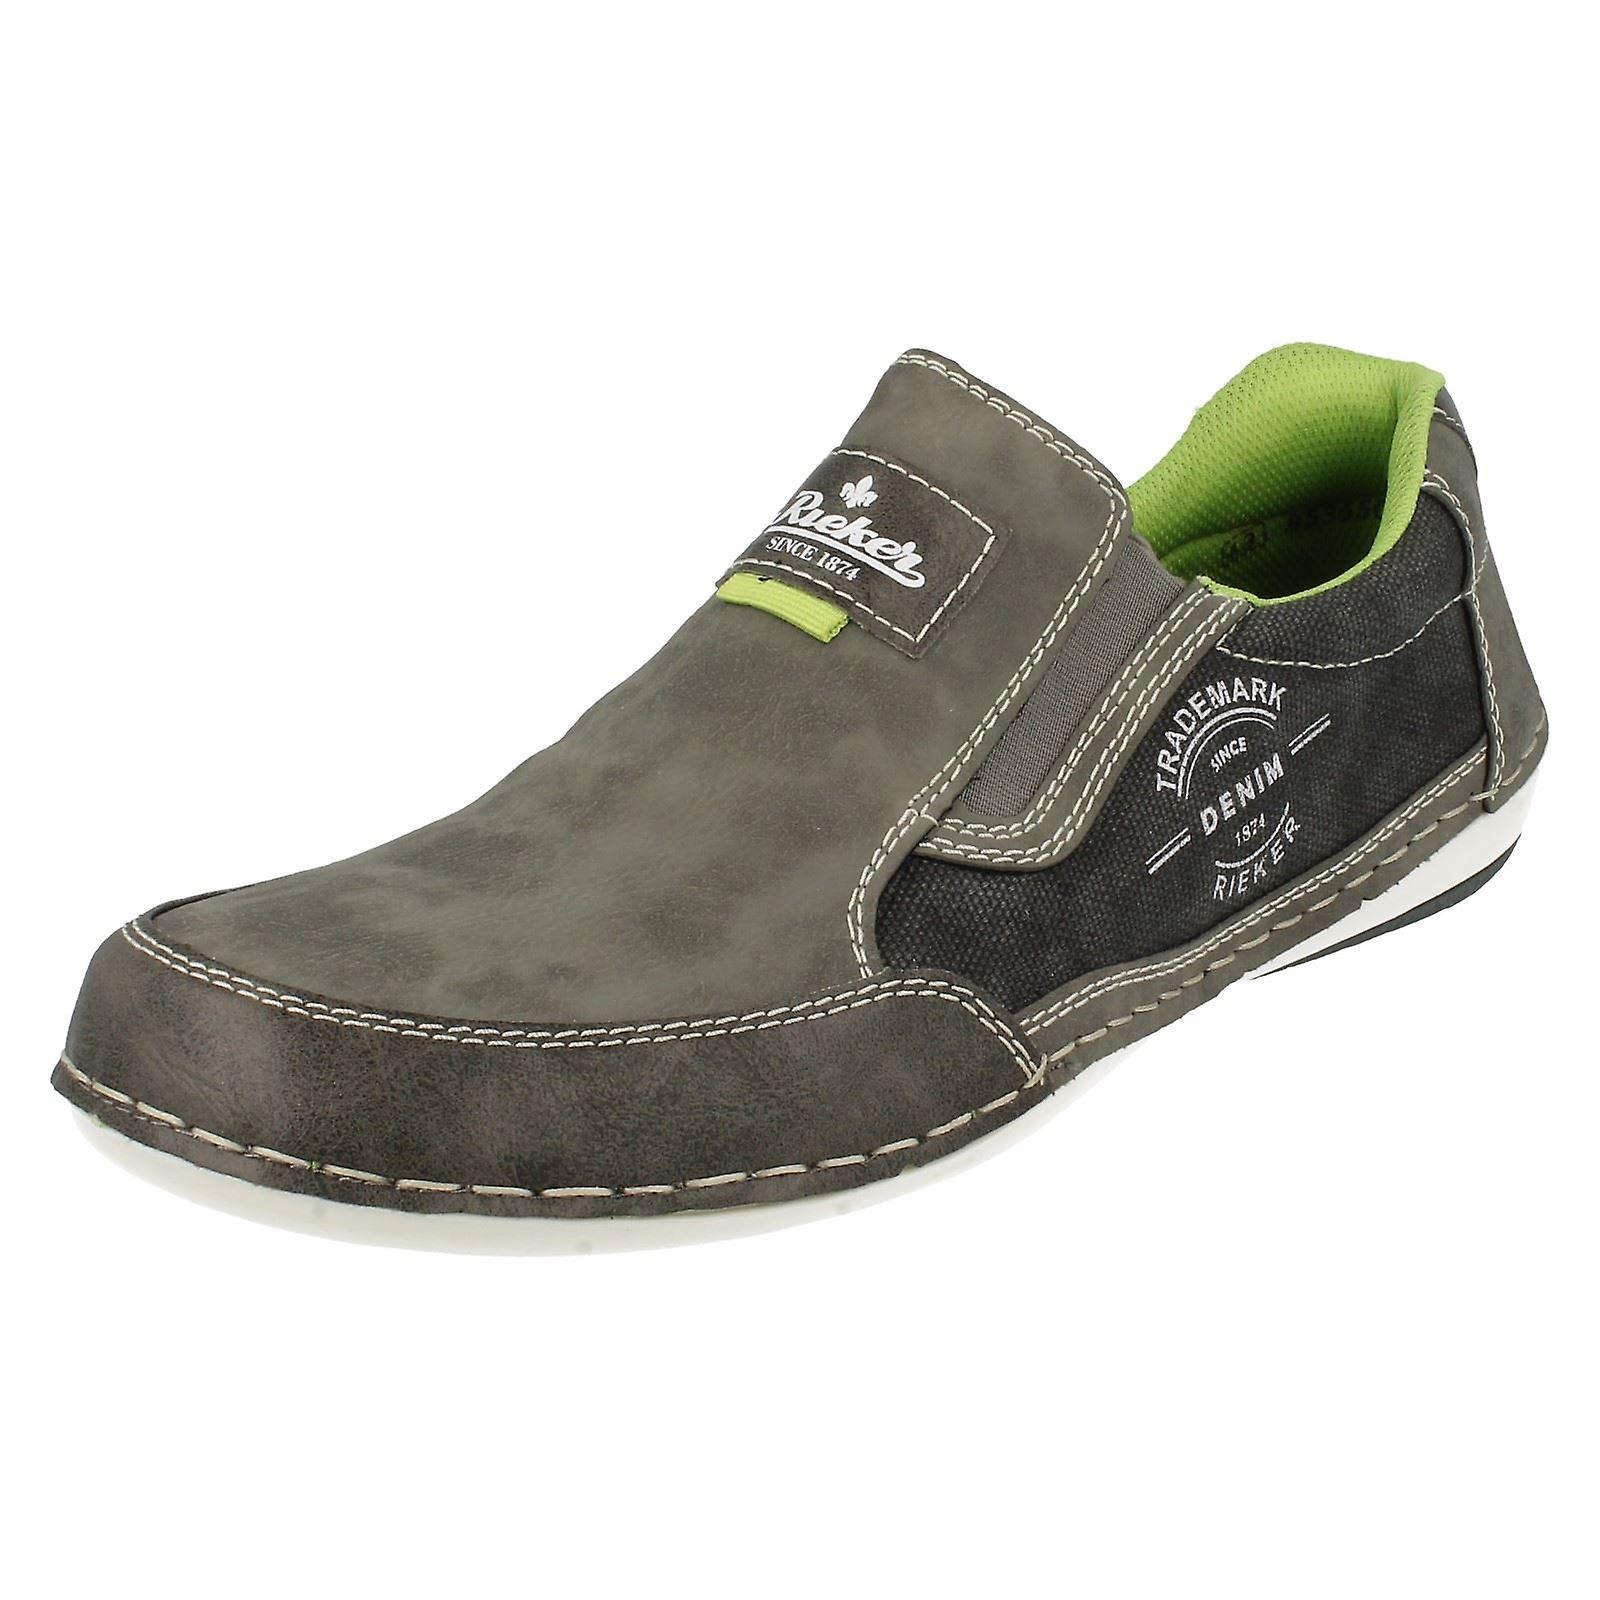 Casual Herren Rieker Schuhe B9251